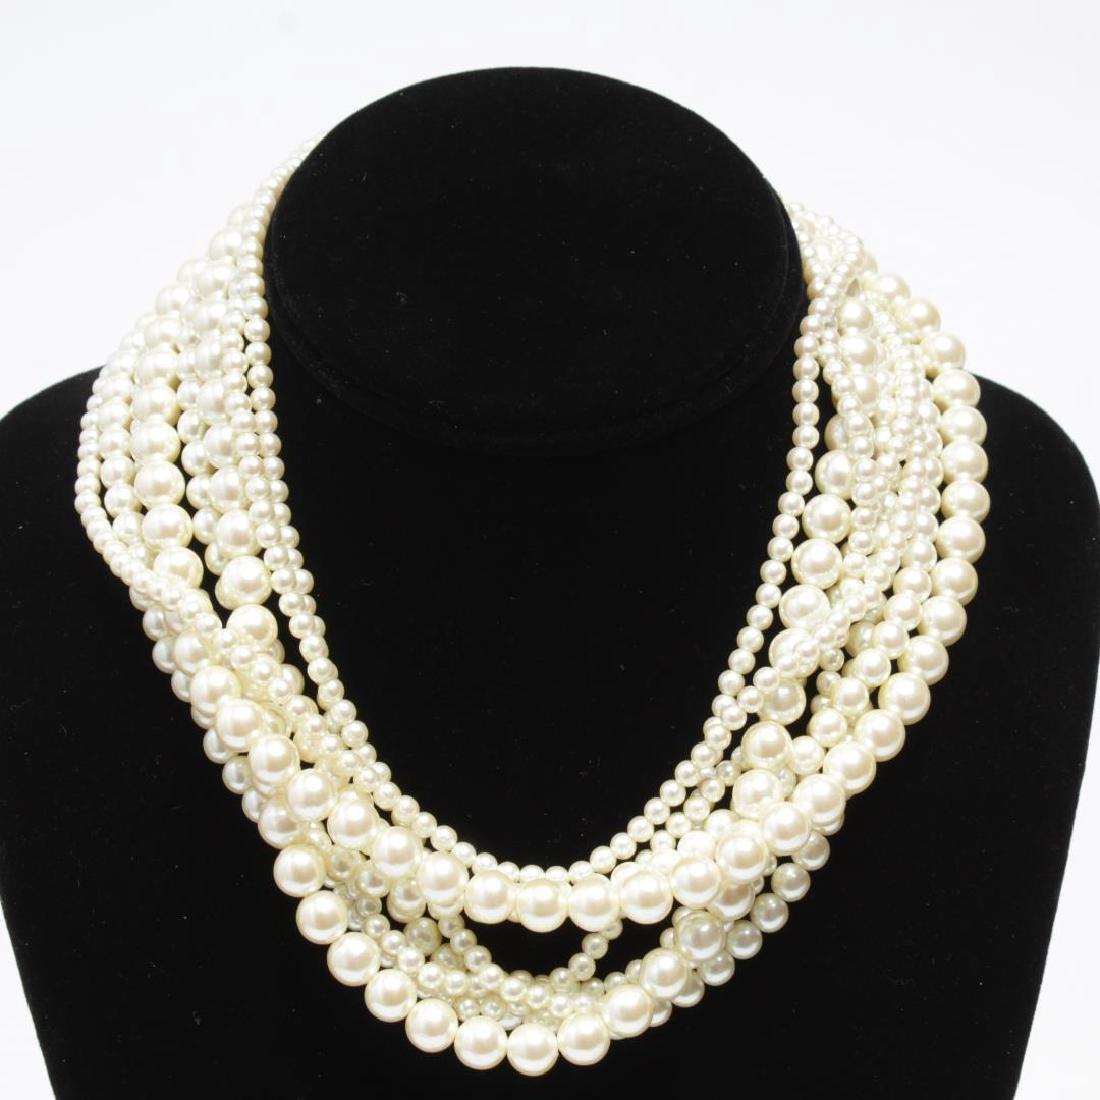 Shell, Bead, Pearl & Metal Costume Jewelry, 11 Pcs - 4